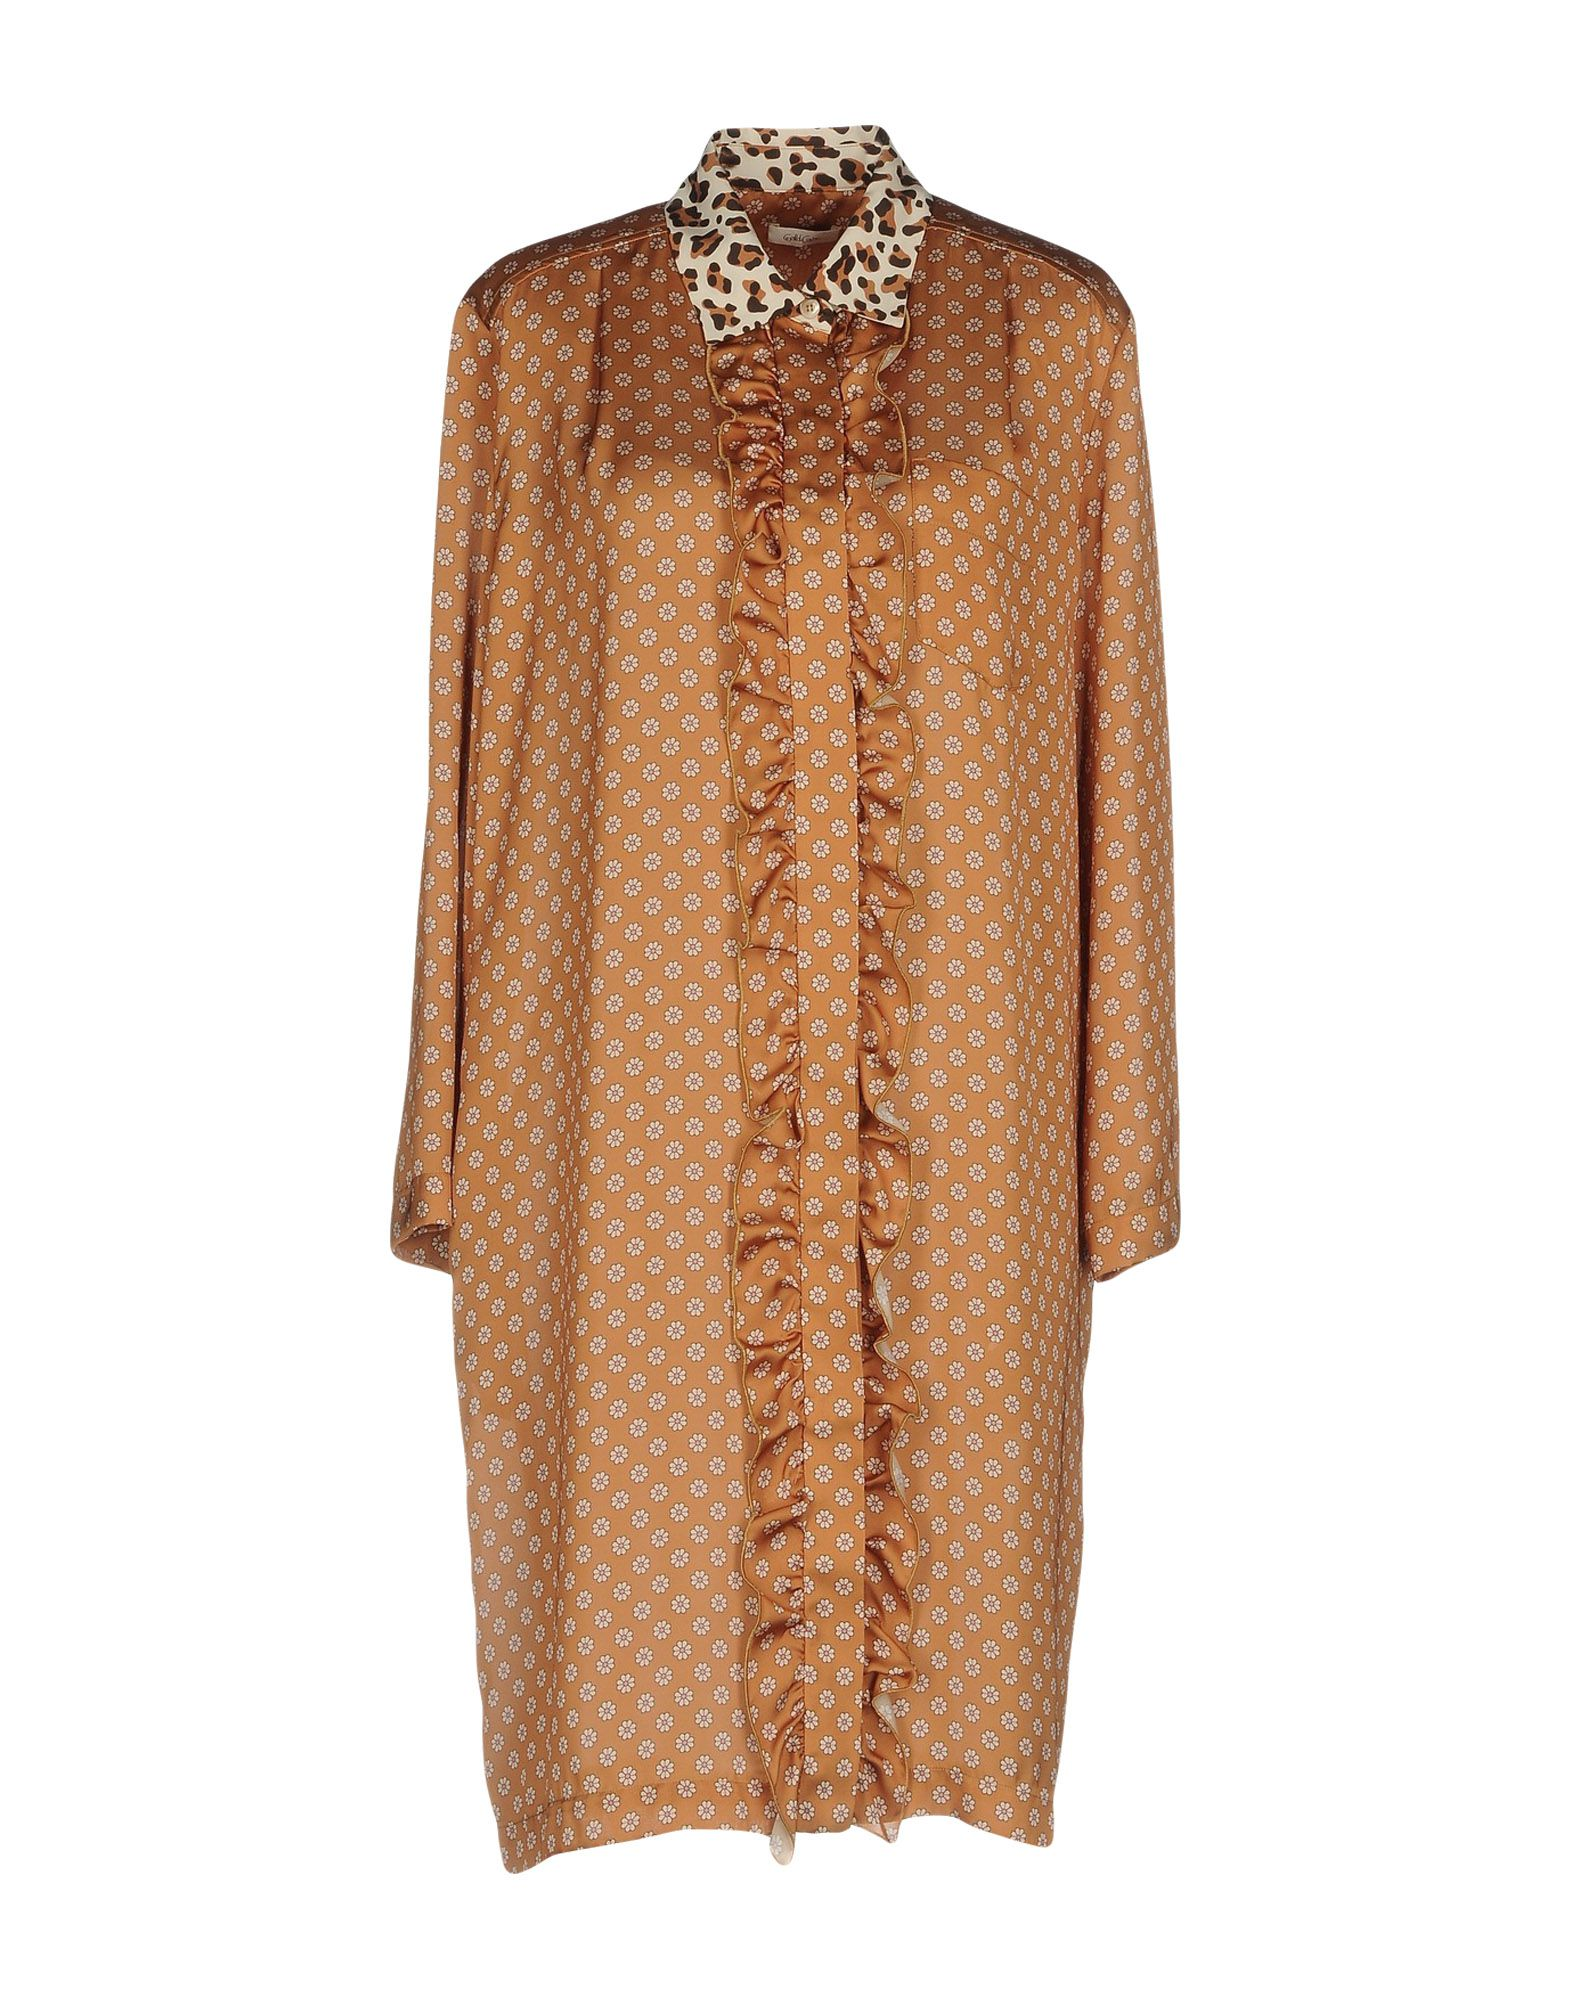 GOLD CASE Короткое платье piccione piccione короткое платье